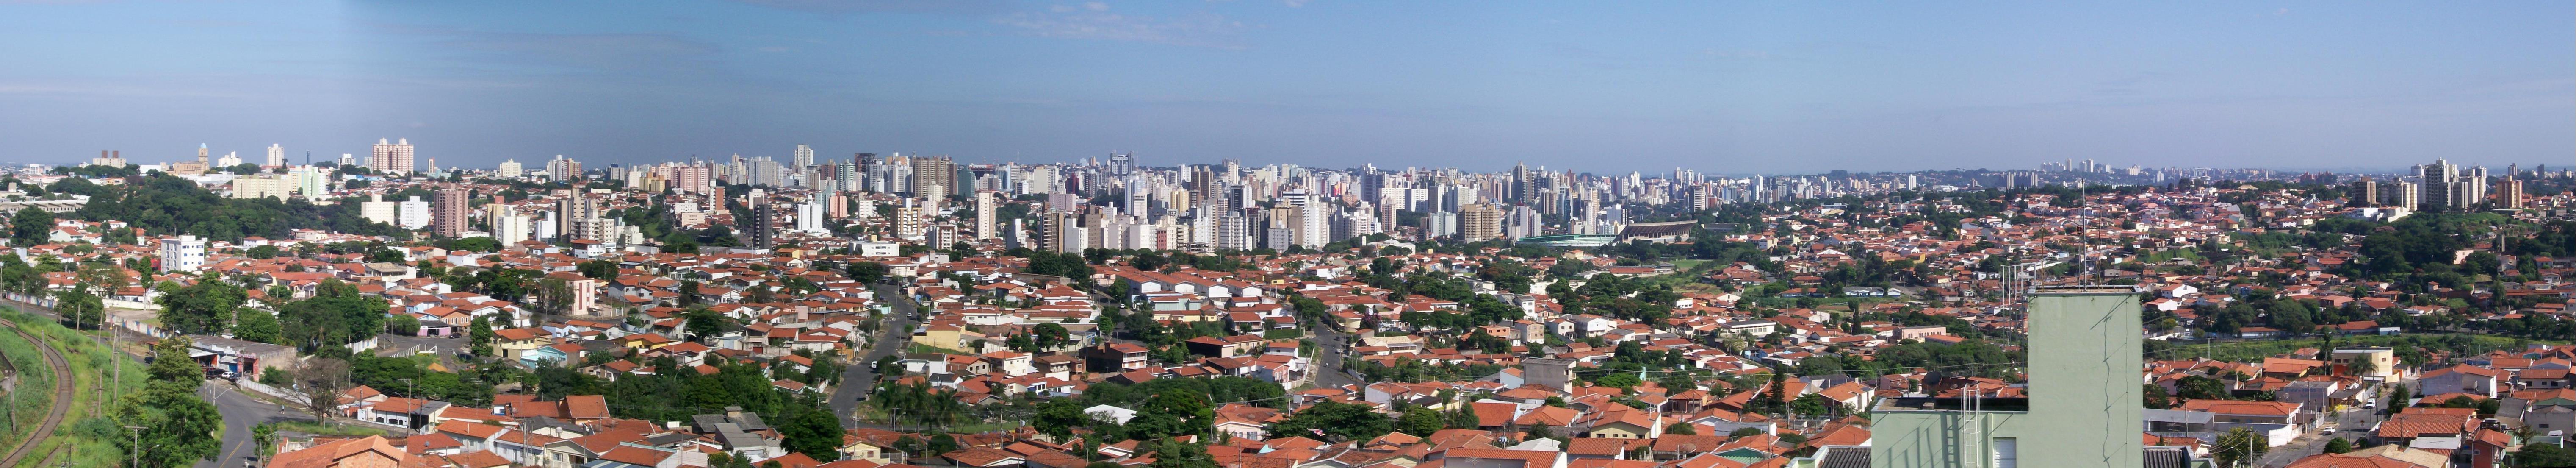 campinas brasil: